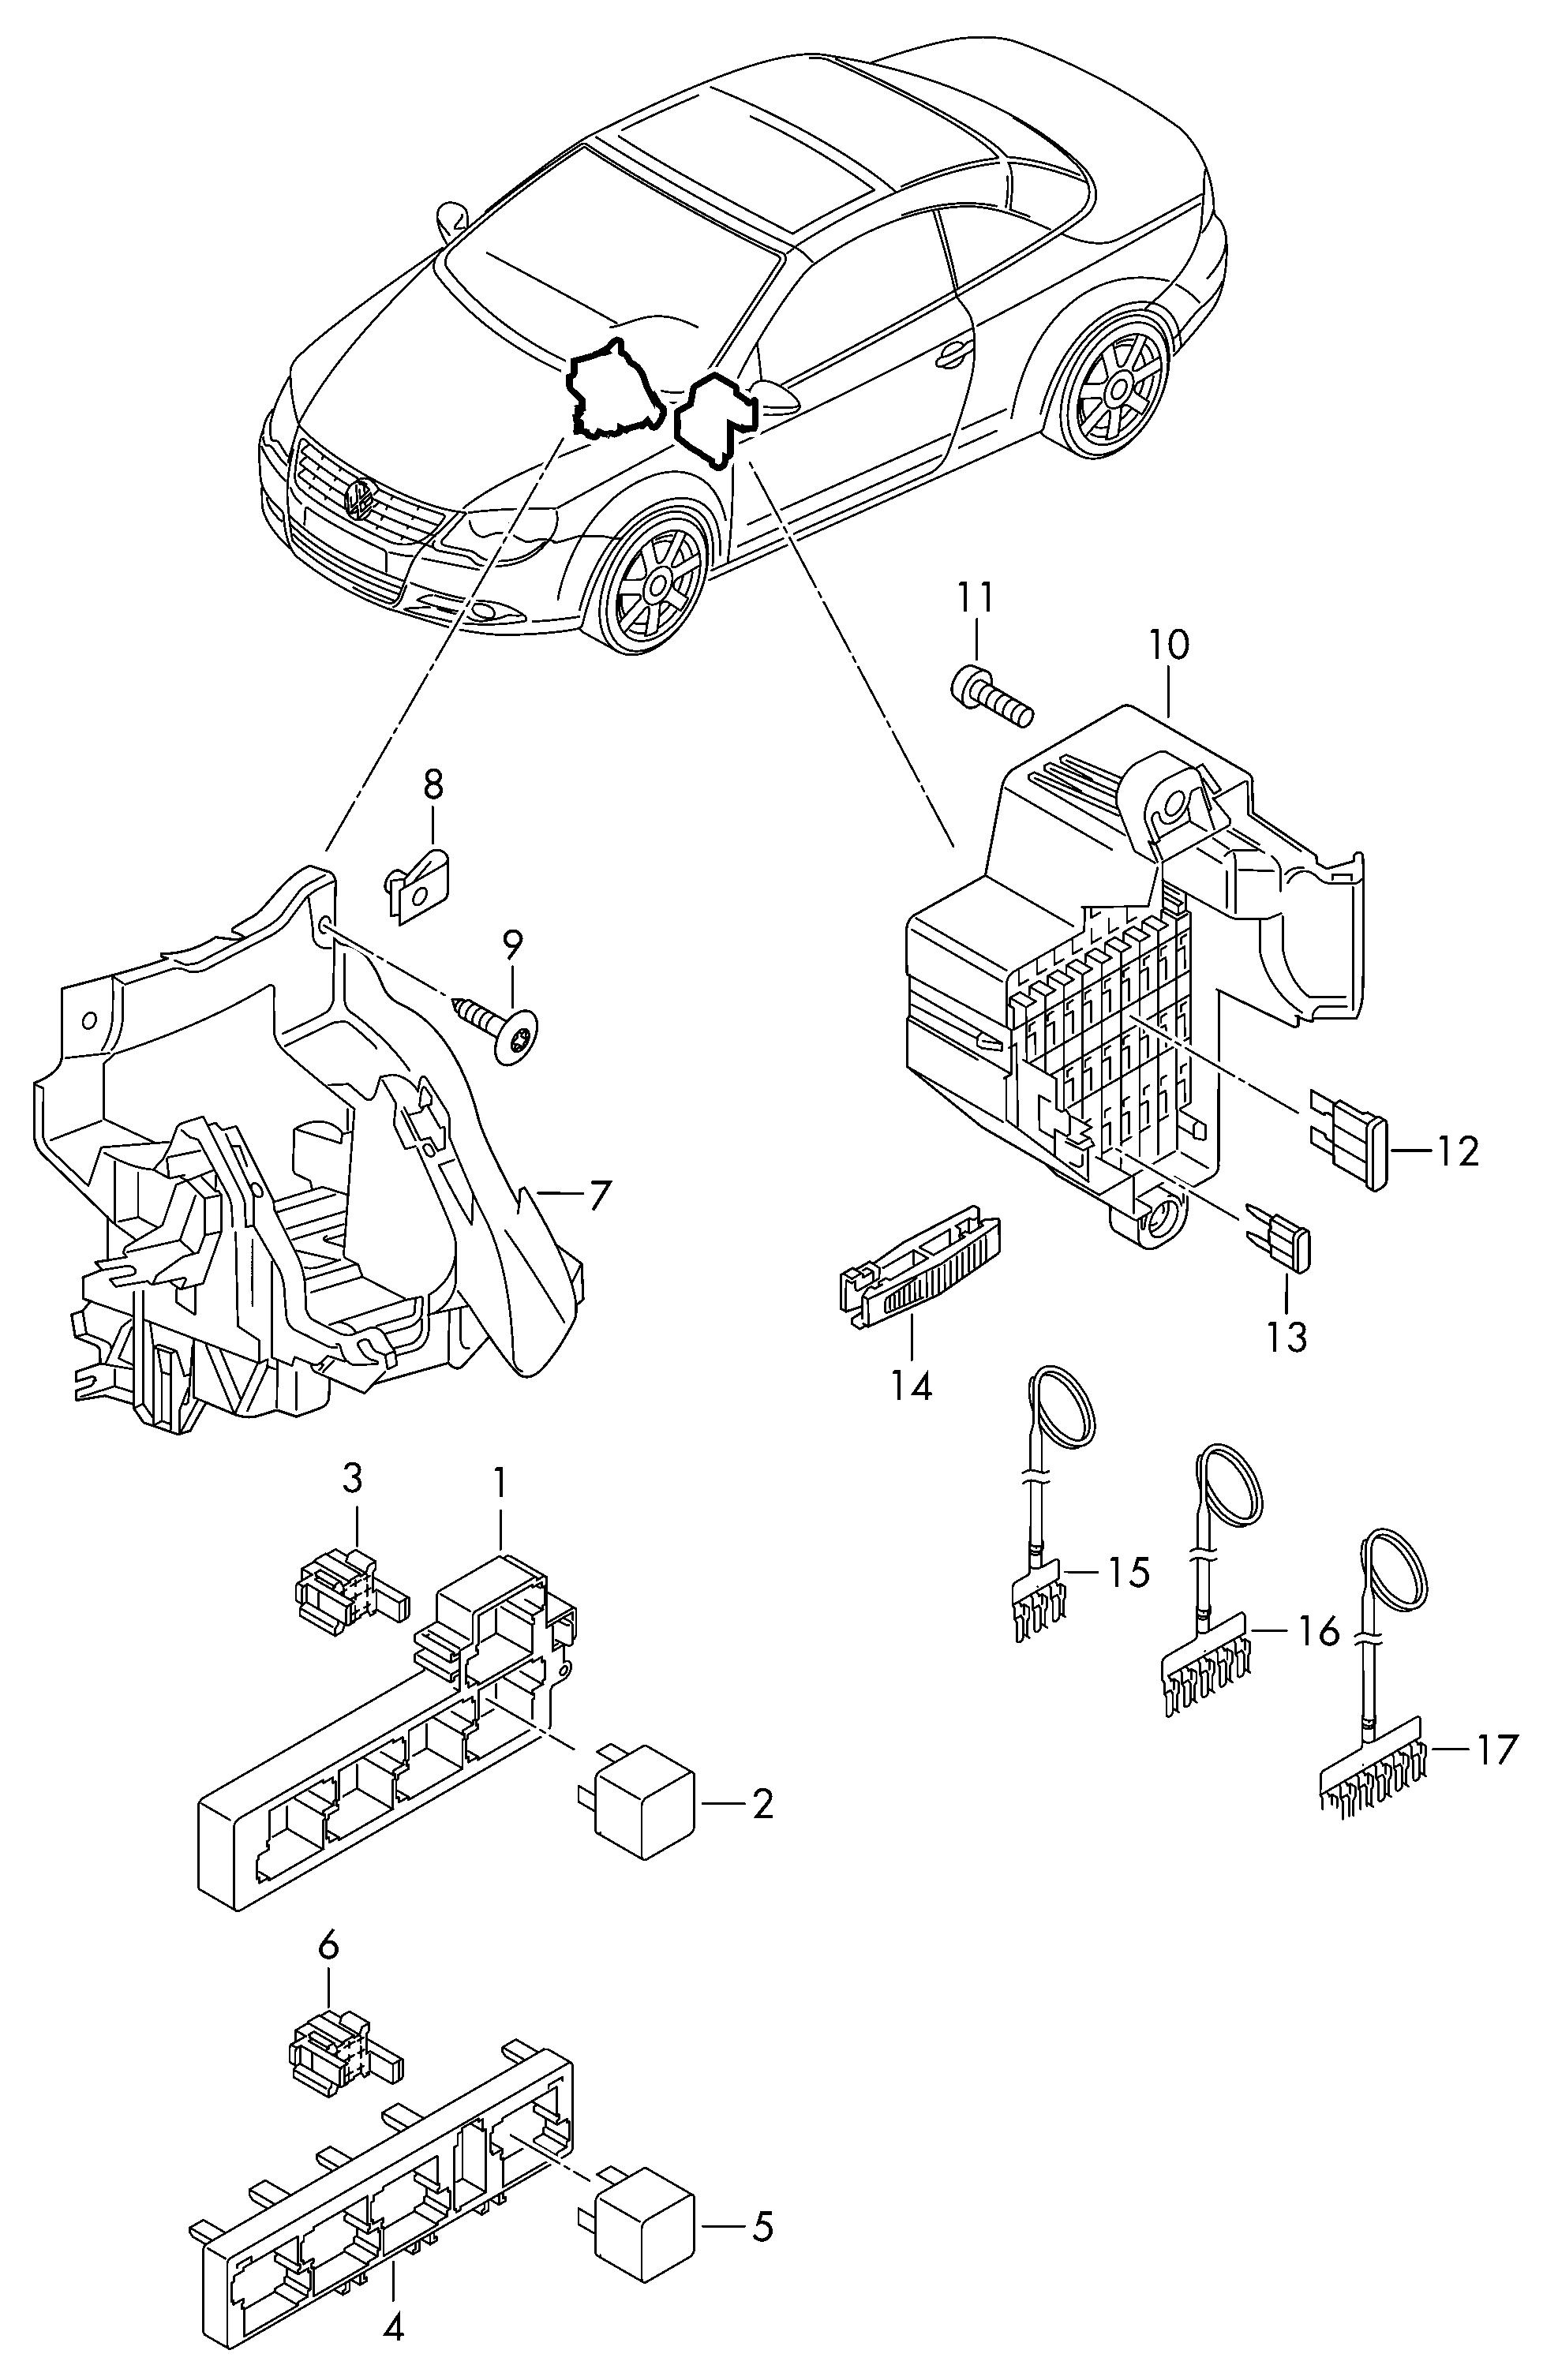 [DHAV_9290]  LS_7317] Volkswagen Eos Fuse Box Schematic Wiring   Vw Eos Fuse Box      Caba Rous Zidur Cular Trons Mohammedshrine Librar Wiring 101